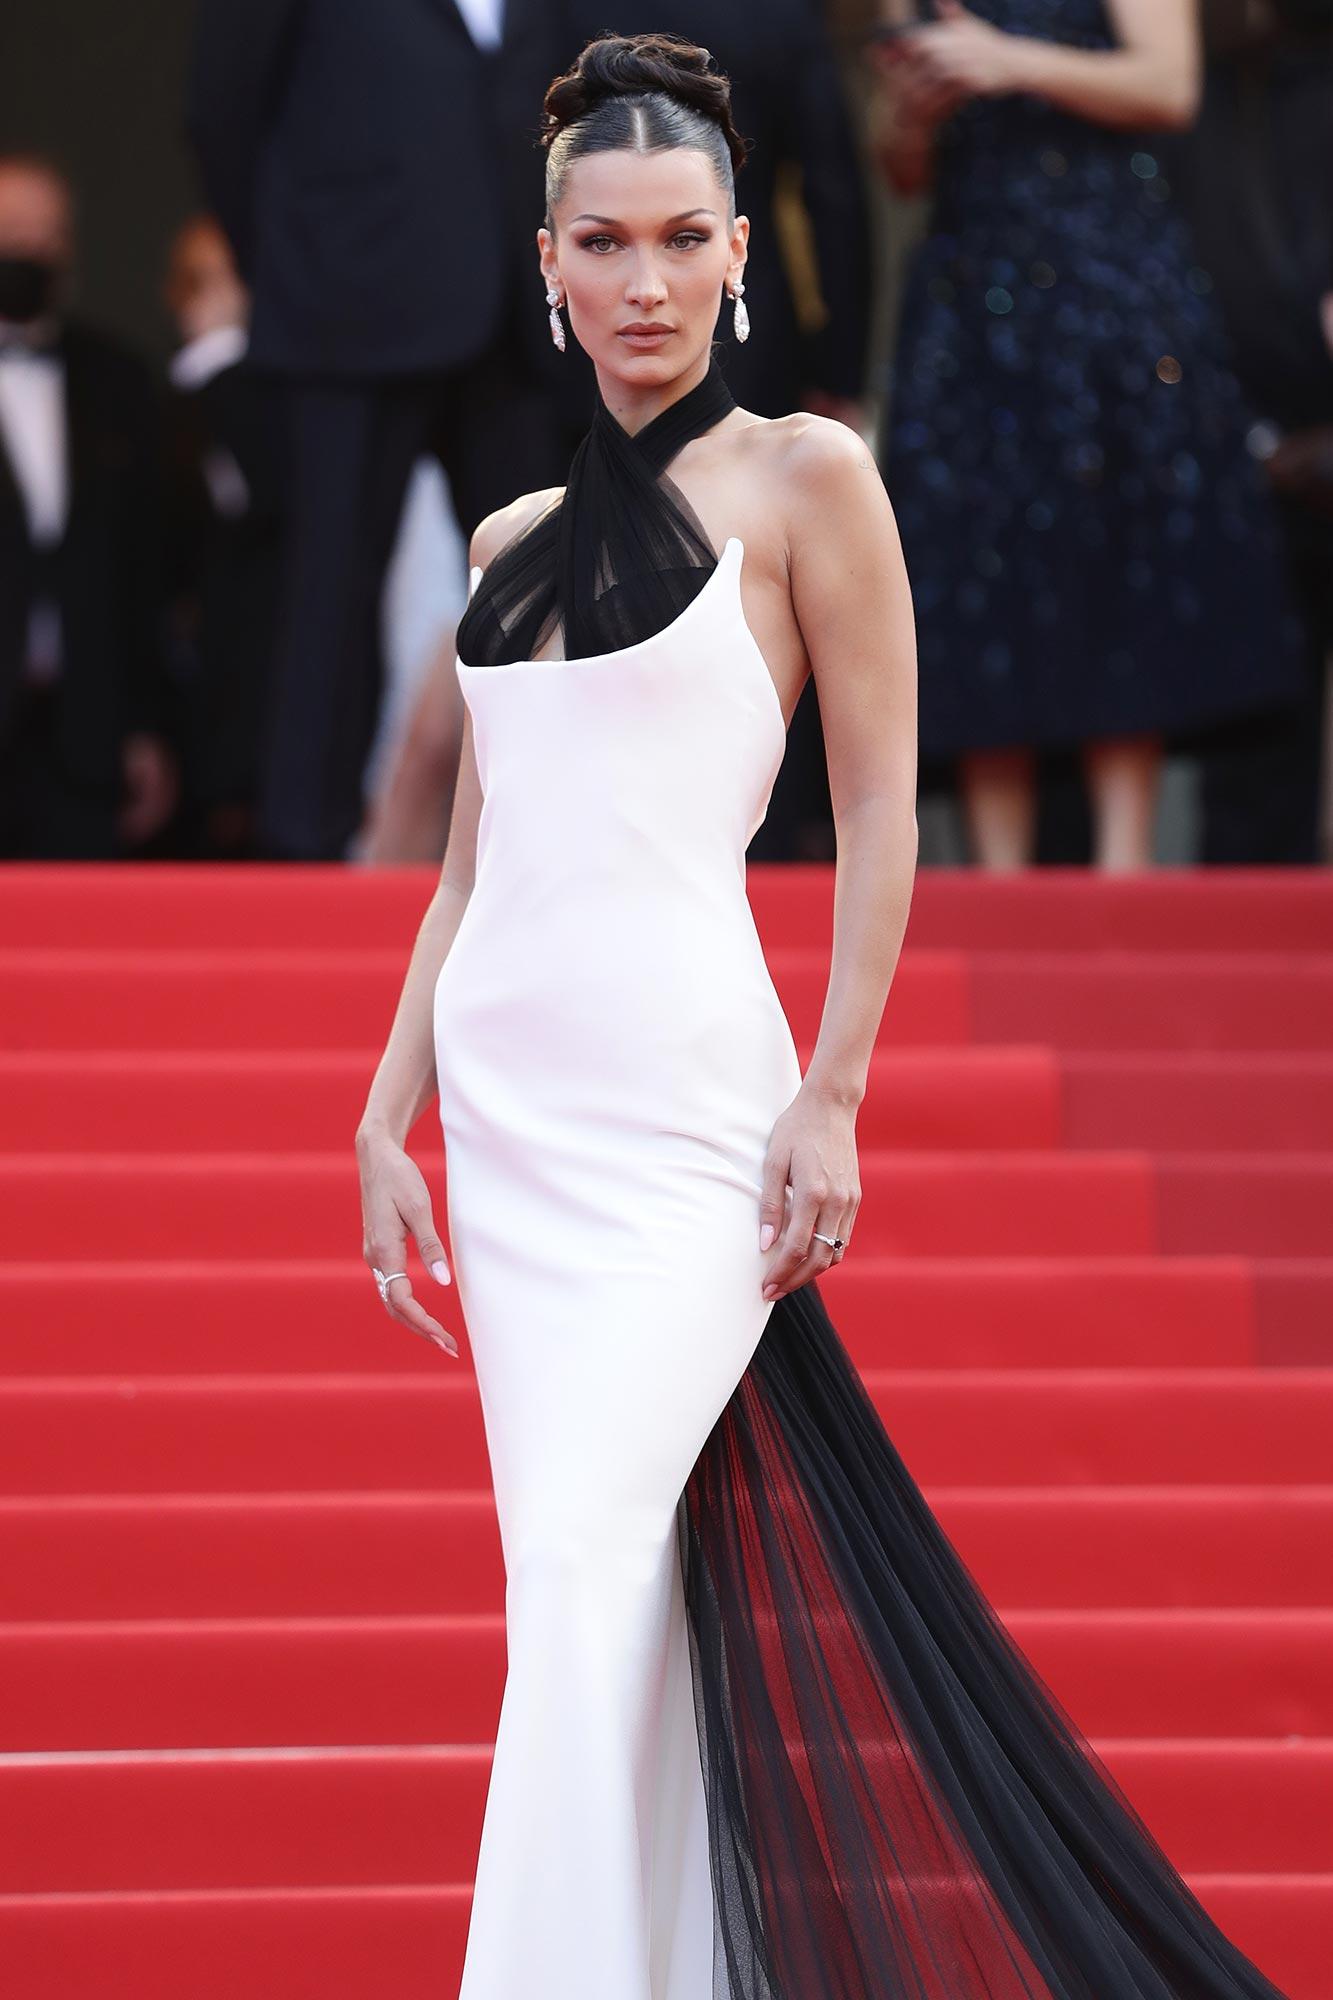 Cannes 2021 Red Carpet - Bella Hadid